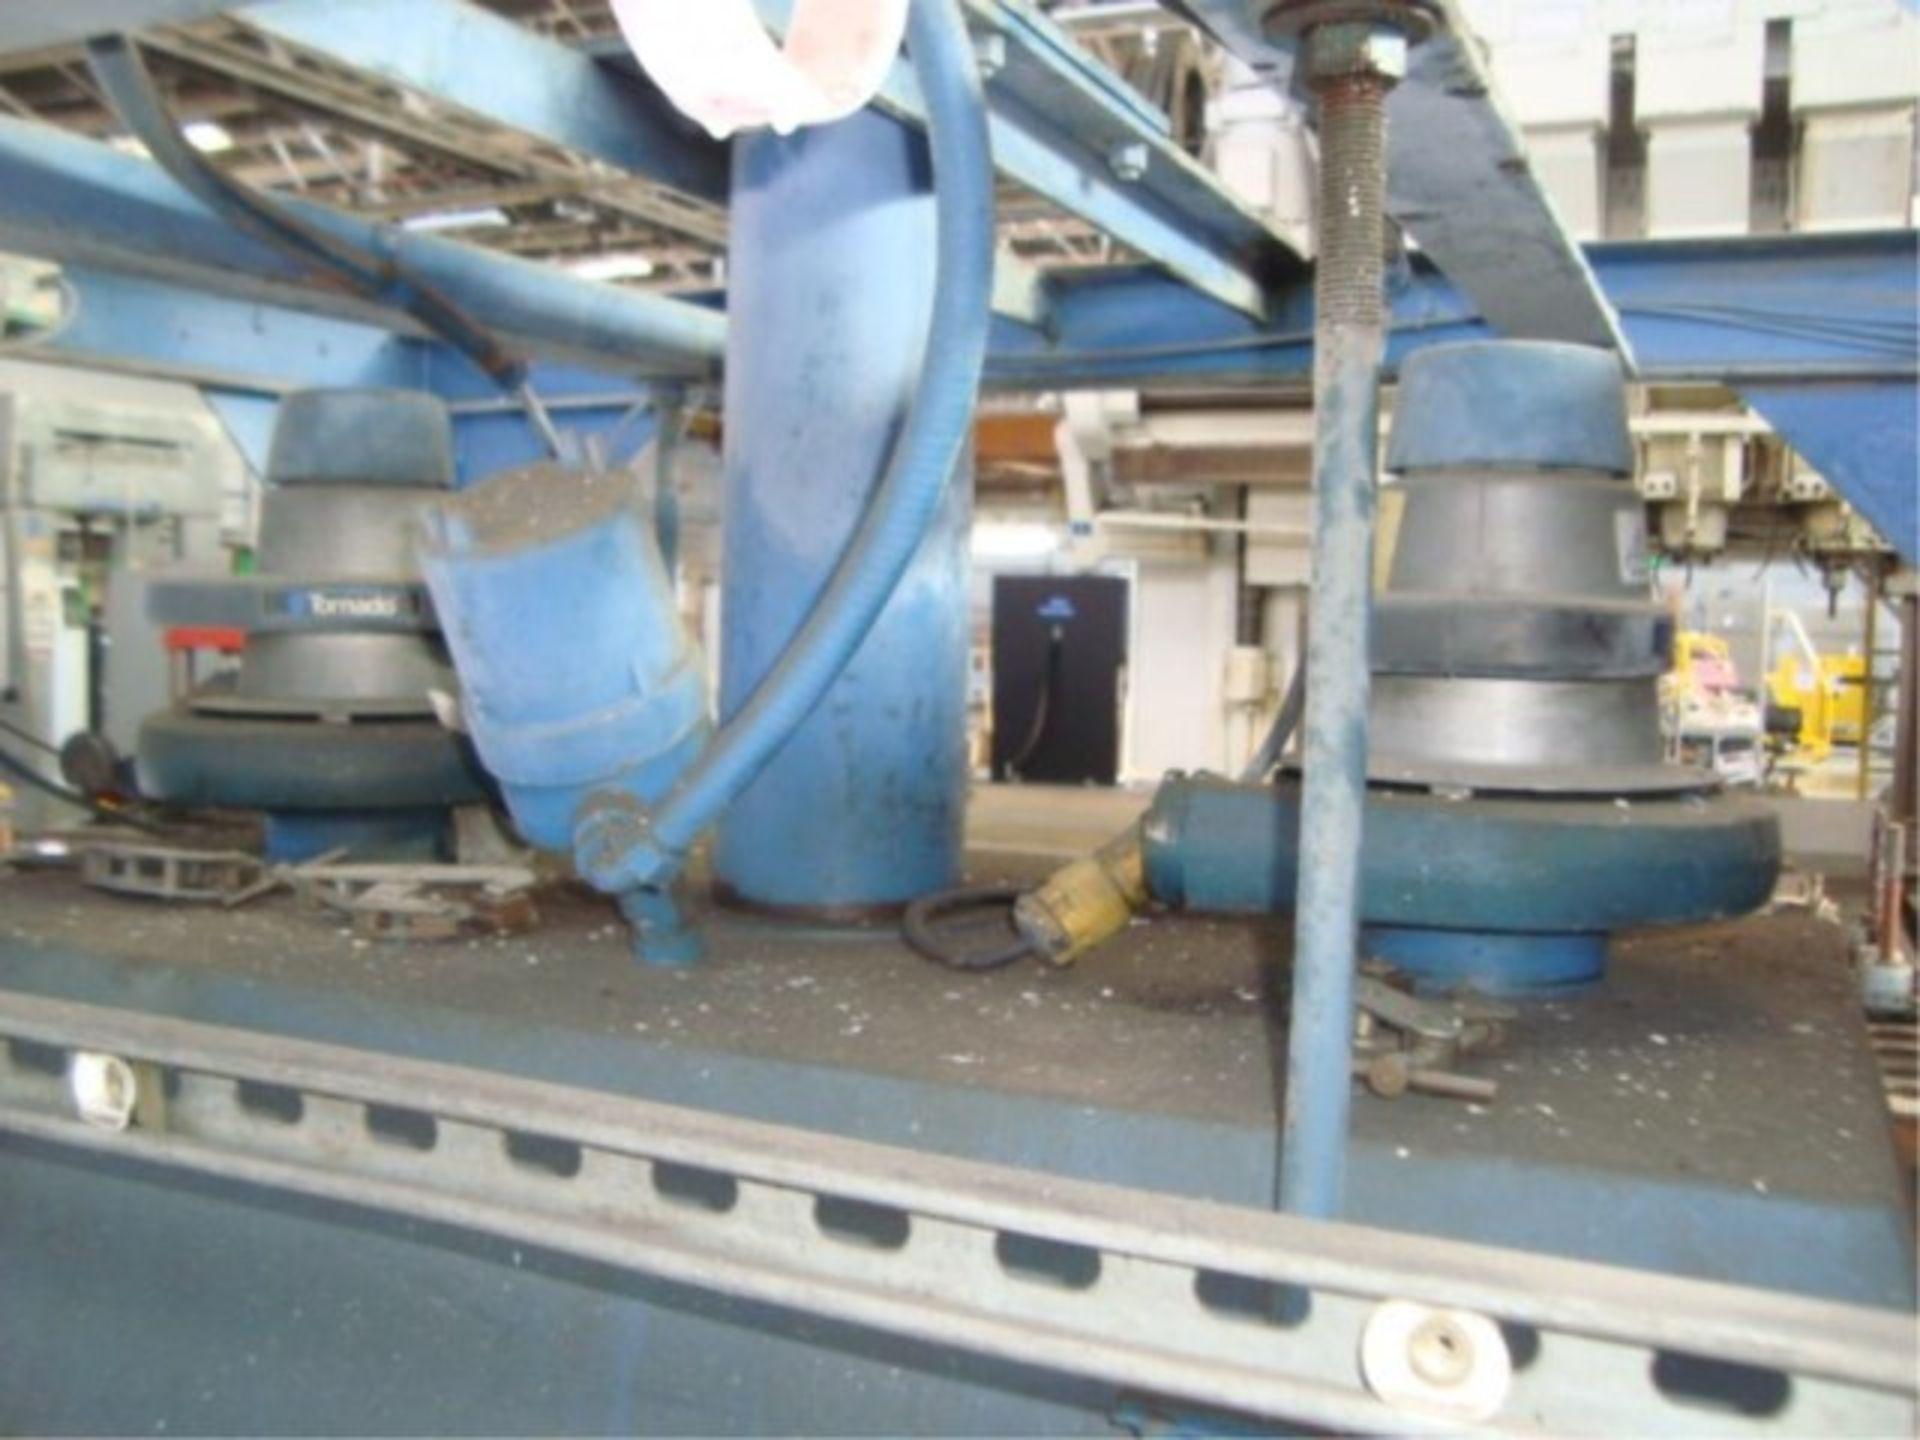 Lot 146 - Heavy Duty Four Spindle CNC Bridge Mill